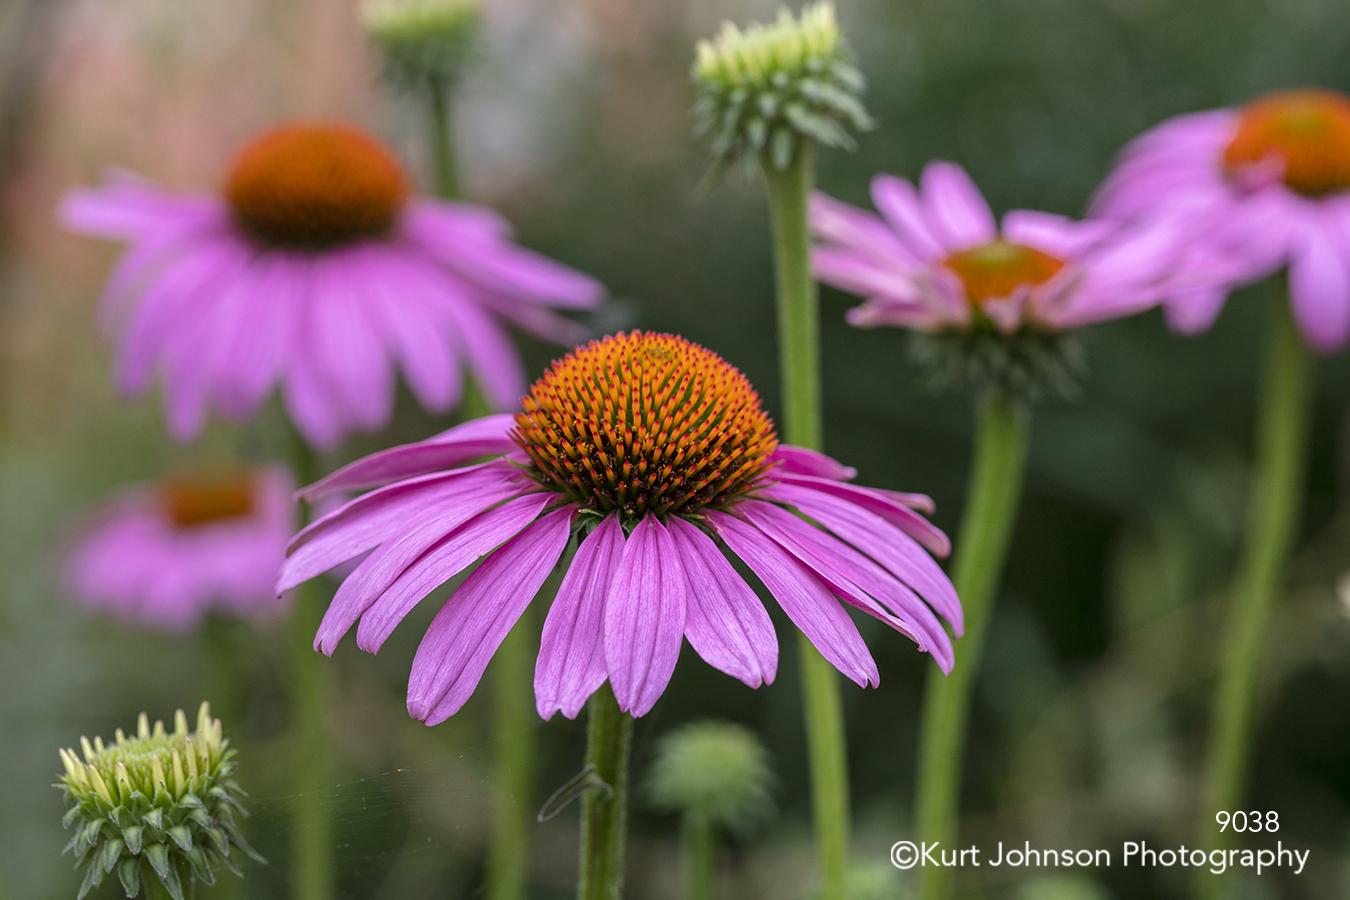 bright pink coneflower summer flowers happy flower conflowers green field meadow